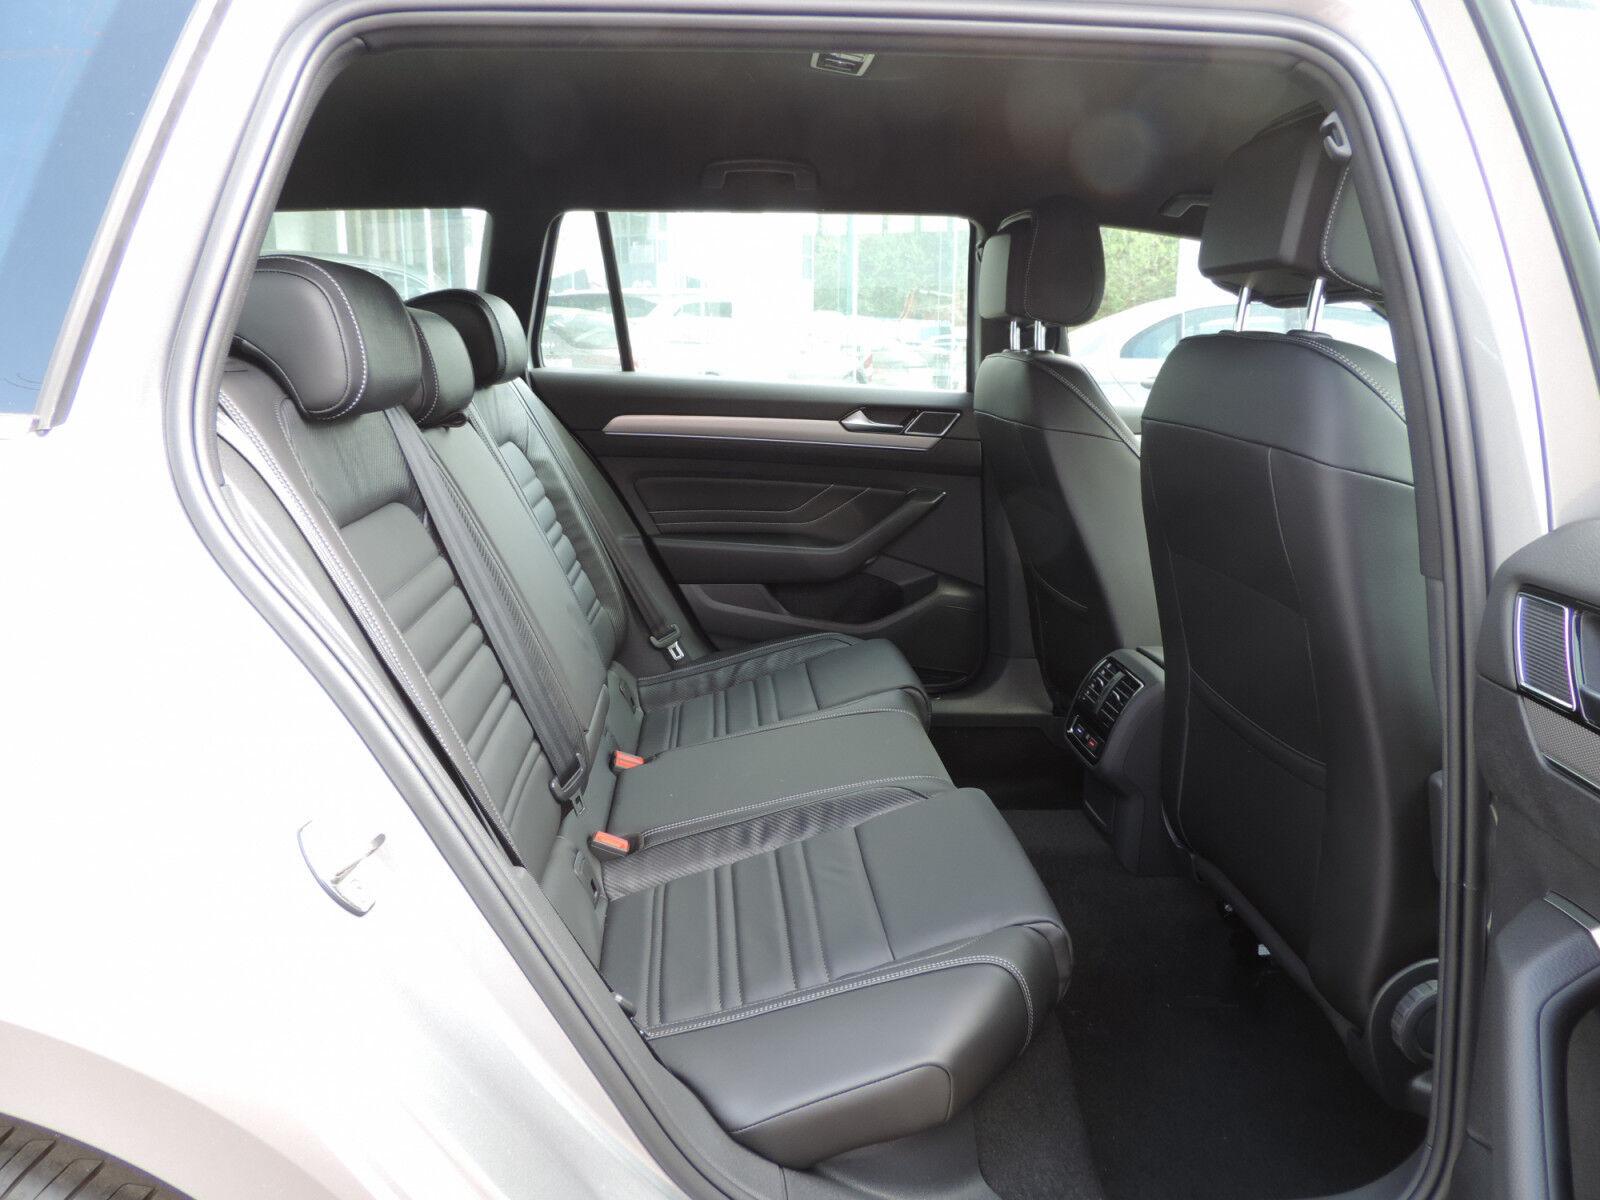 Volkswagen Passat Variant 2.0 TSI R-Line DSG CUIR GPS ACC LANE NEUVE 7/15